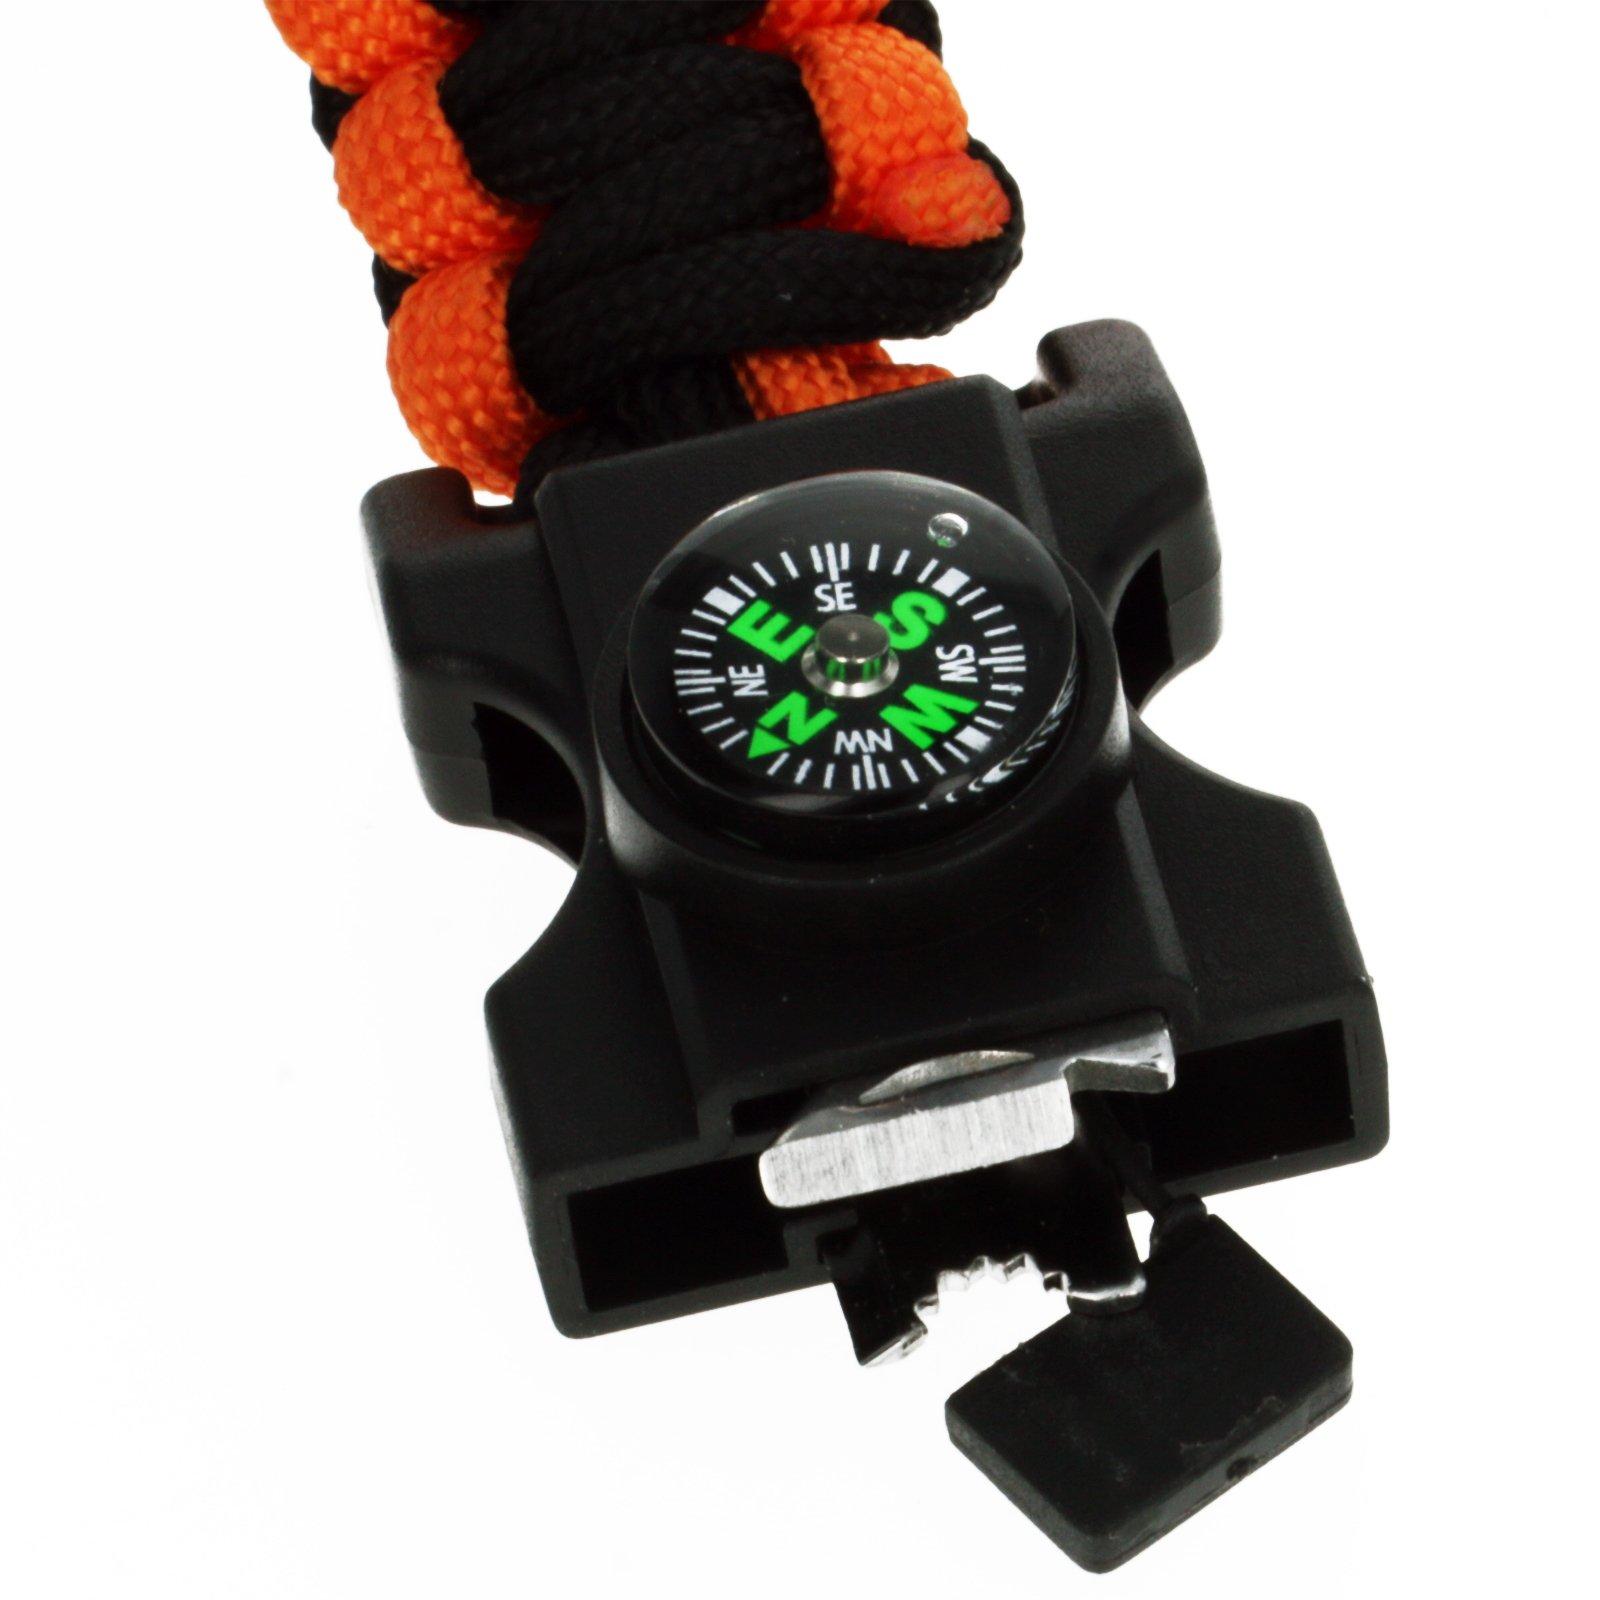 ASR Outdoor- Multitool Paracord Survival Bracelet - Orange and Black